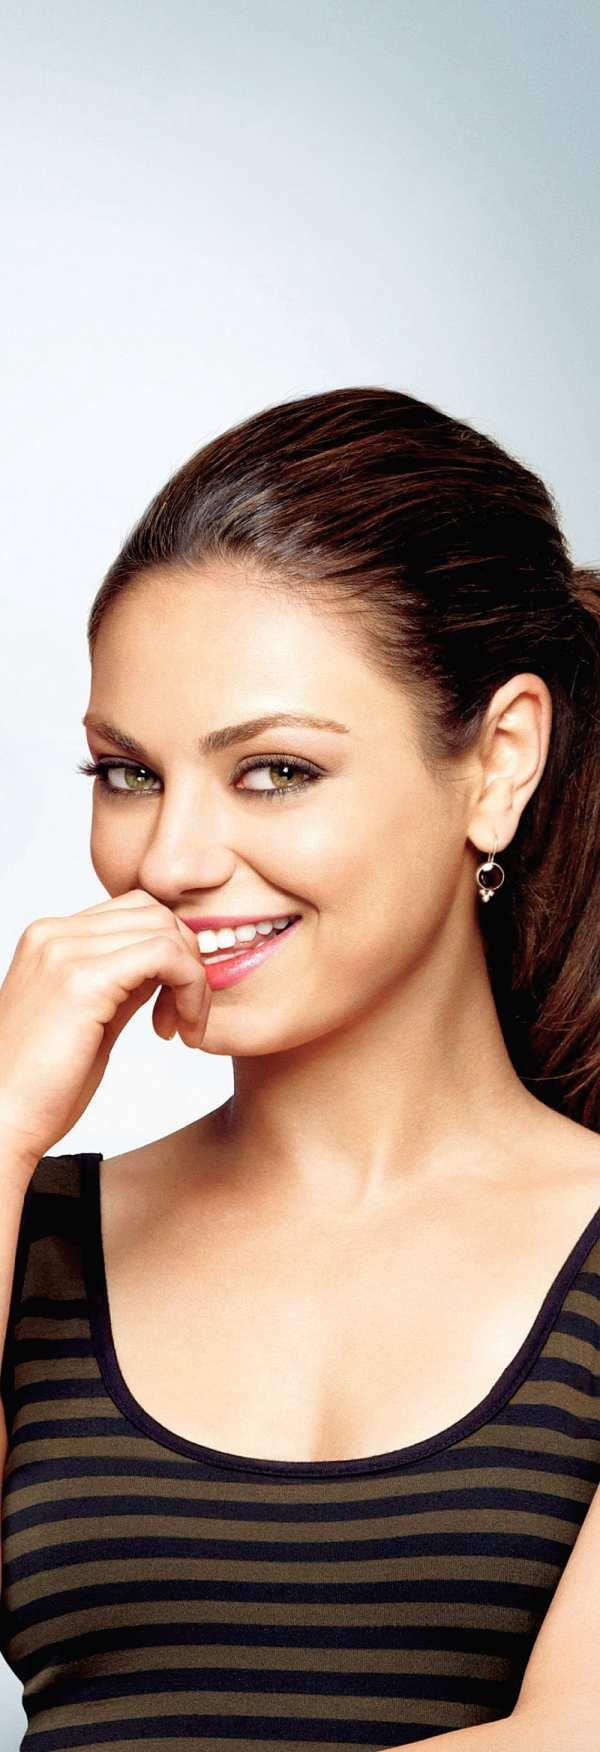 Mila Kunis Smiling Pretty